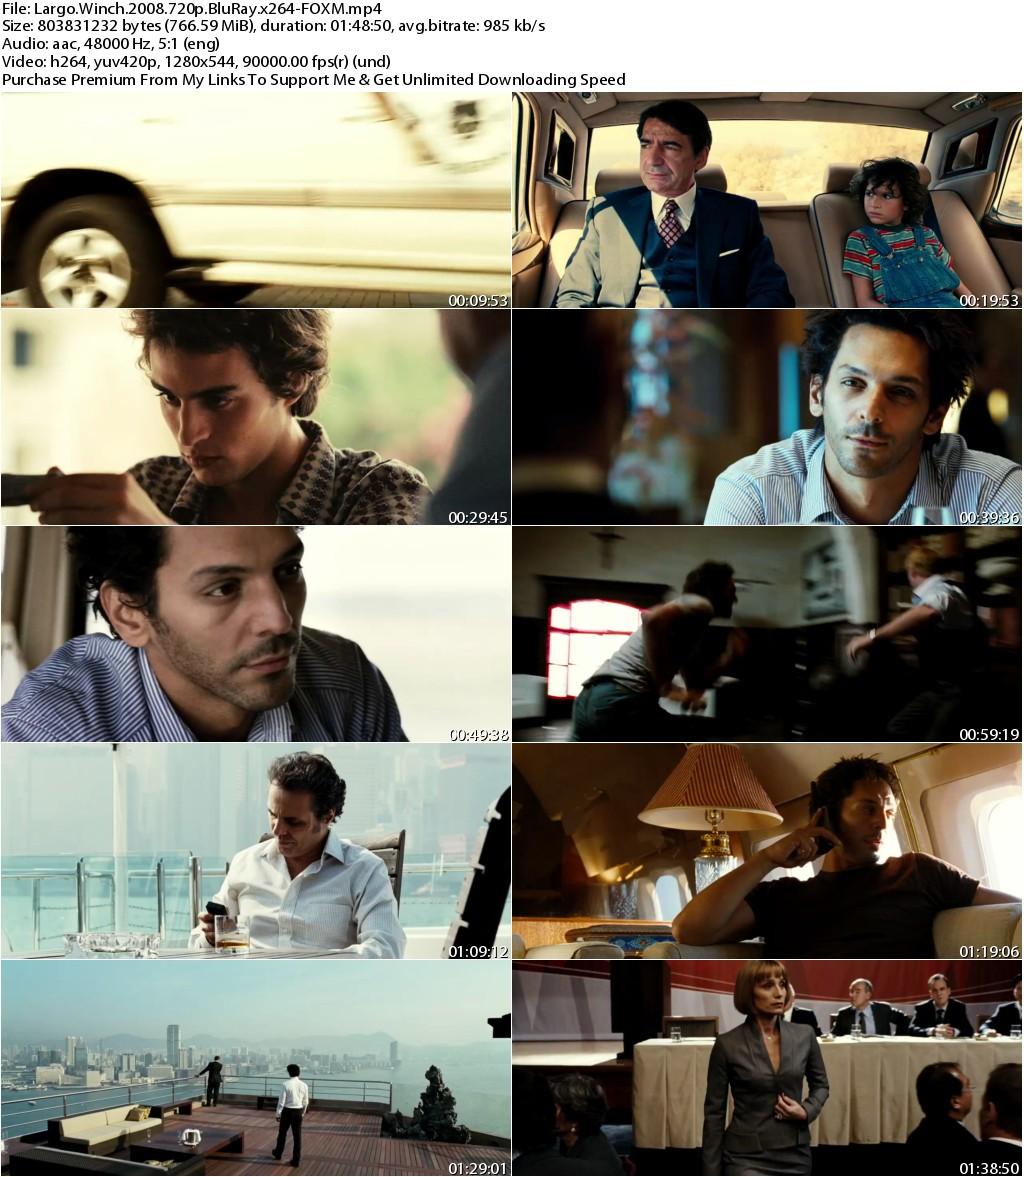 Largo Winch (2008) 720p BluRay x264-FOXM